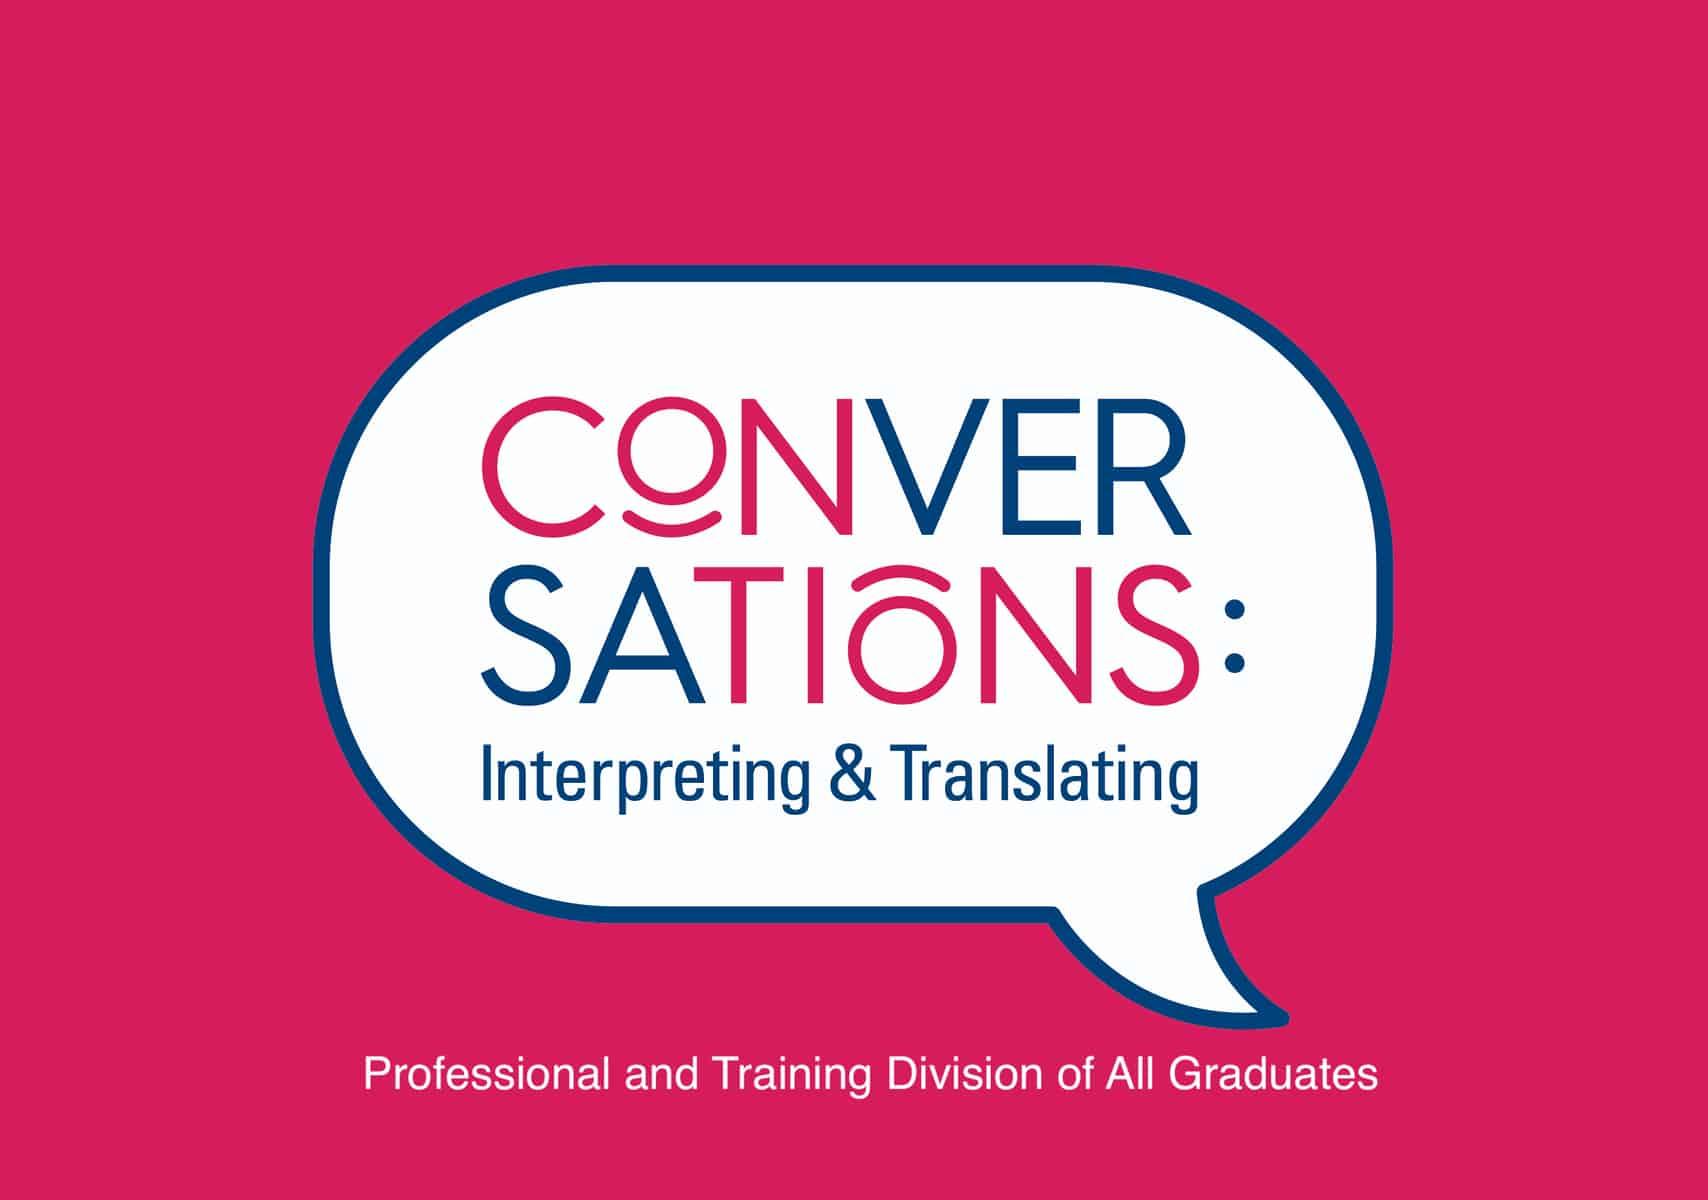 Conversations: